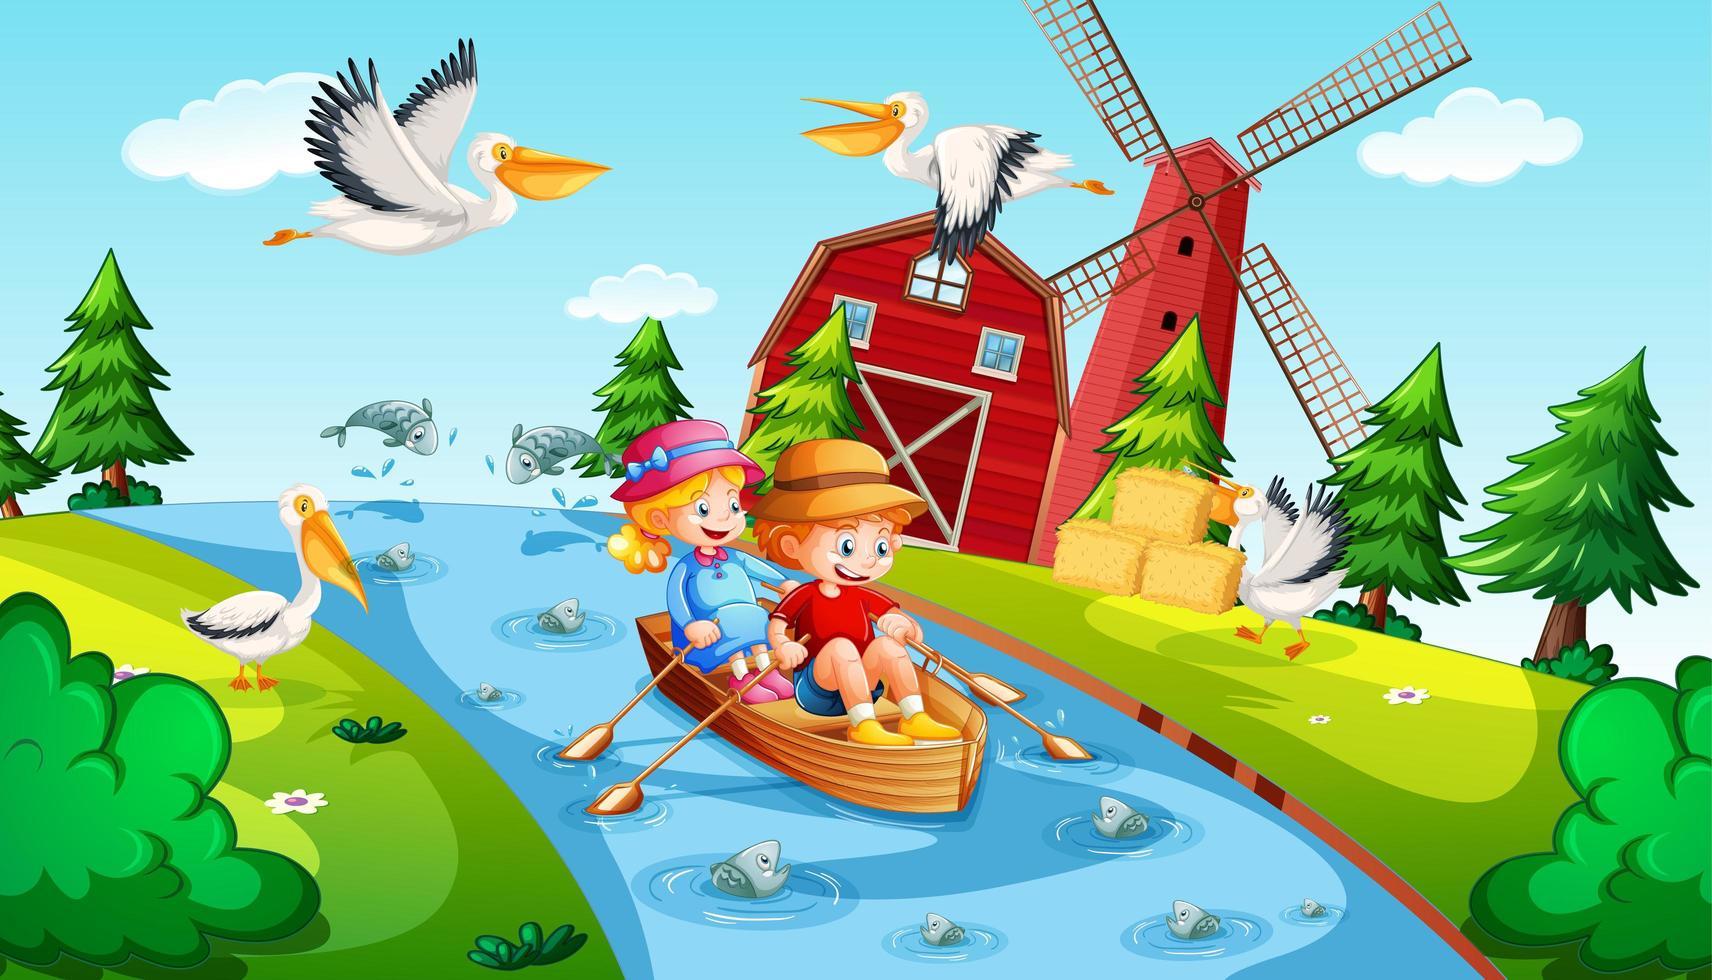 Kinder rudern das Boot in der Bachfarmszene vektor